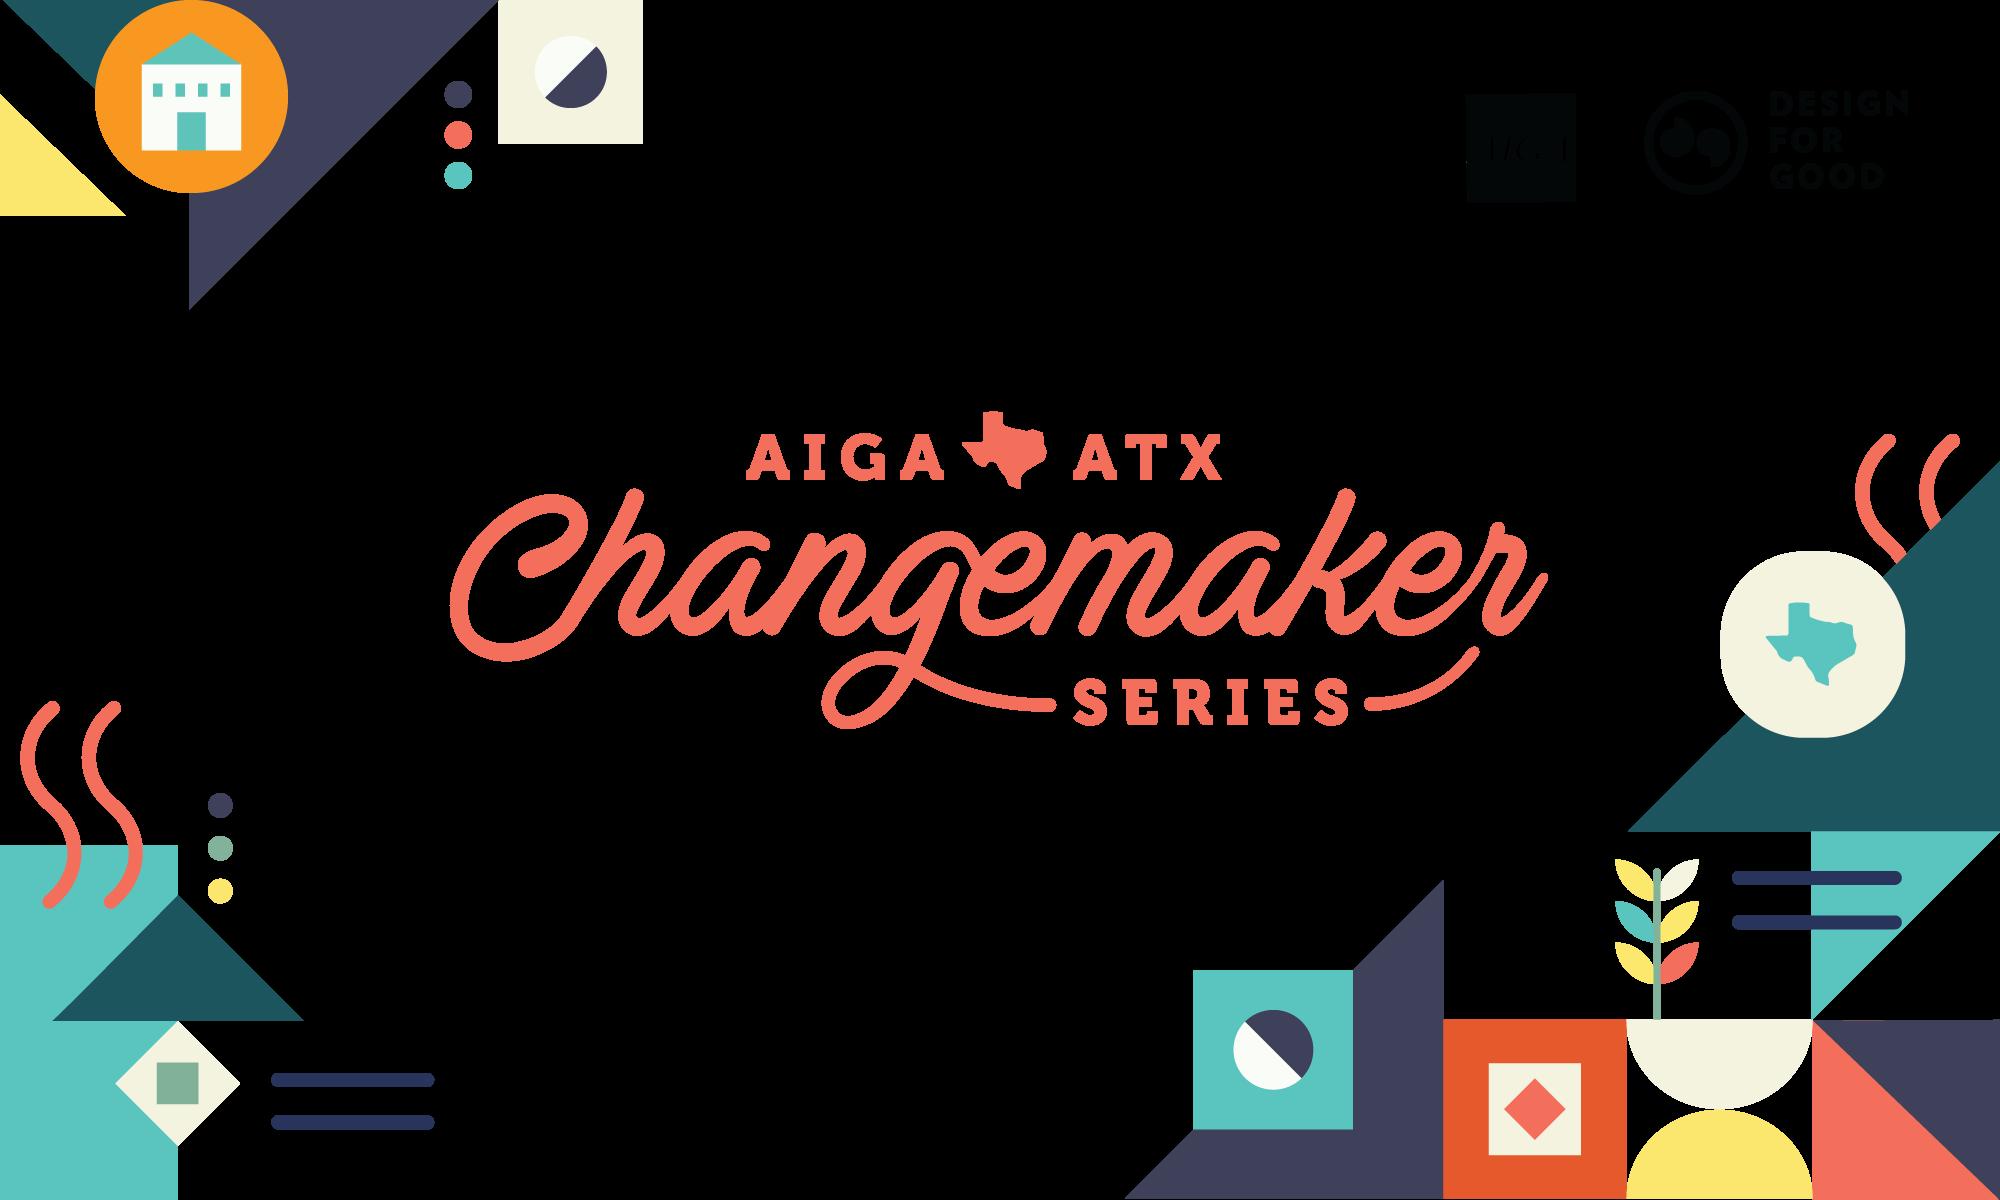 AIGA Austin Changemaker Series